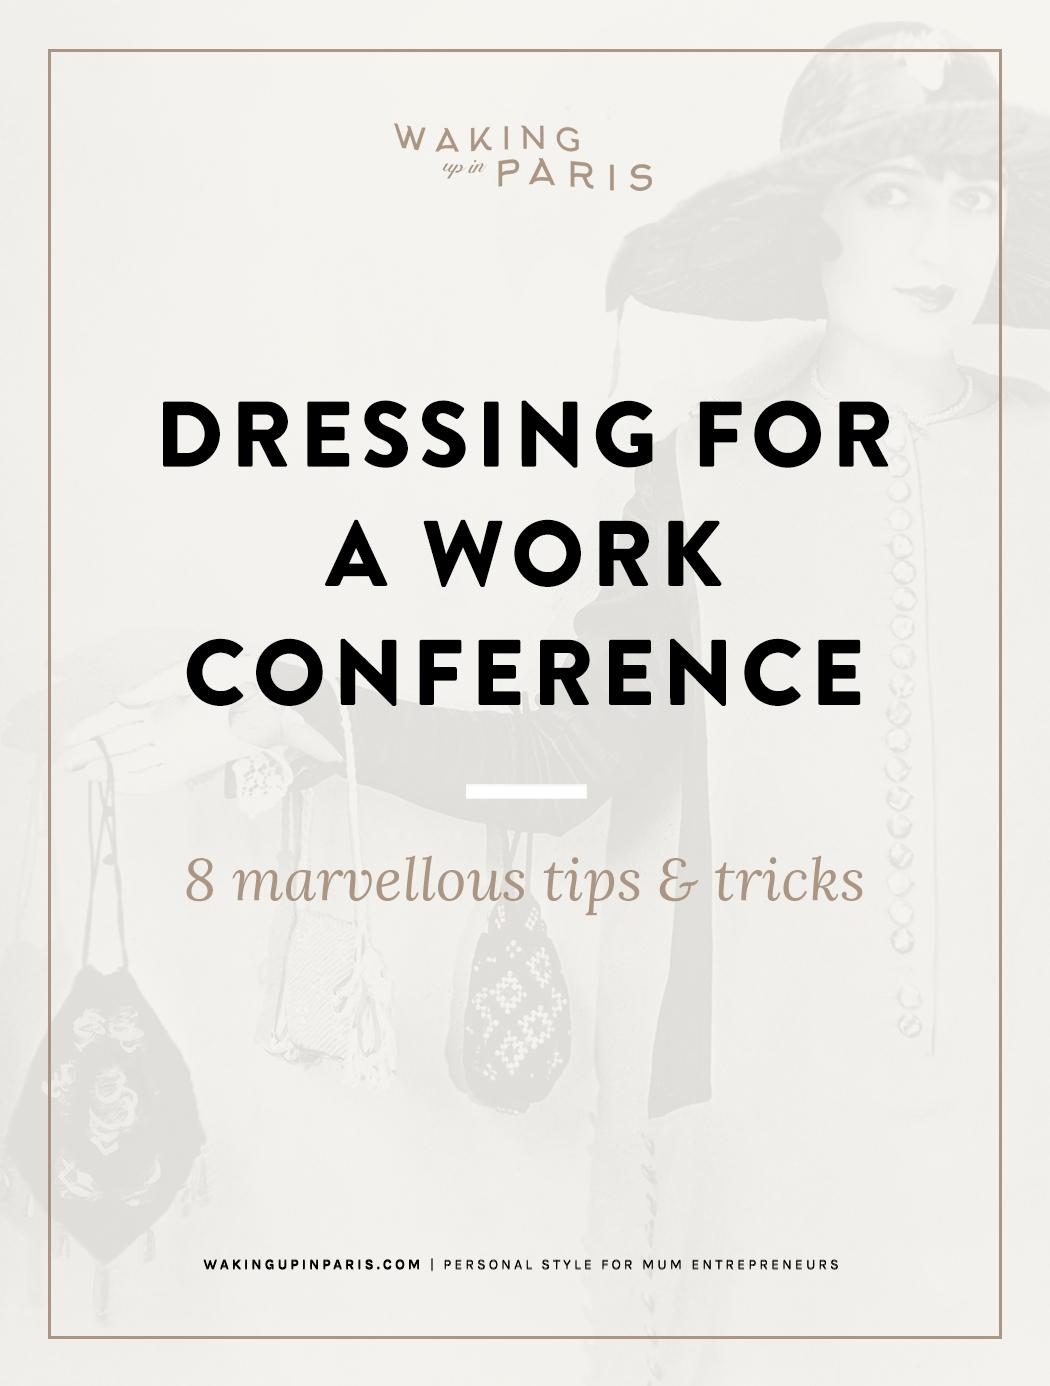 WUIP-clarissa-grace-personal-style-coach-online-mum-entrepreneur-business-work-conference.jpg